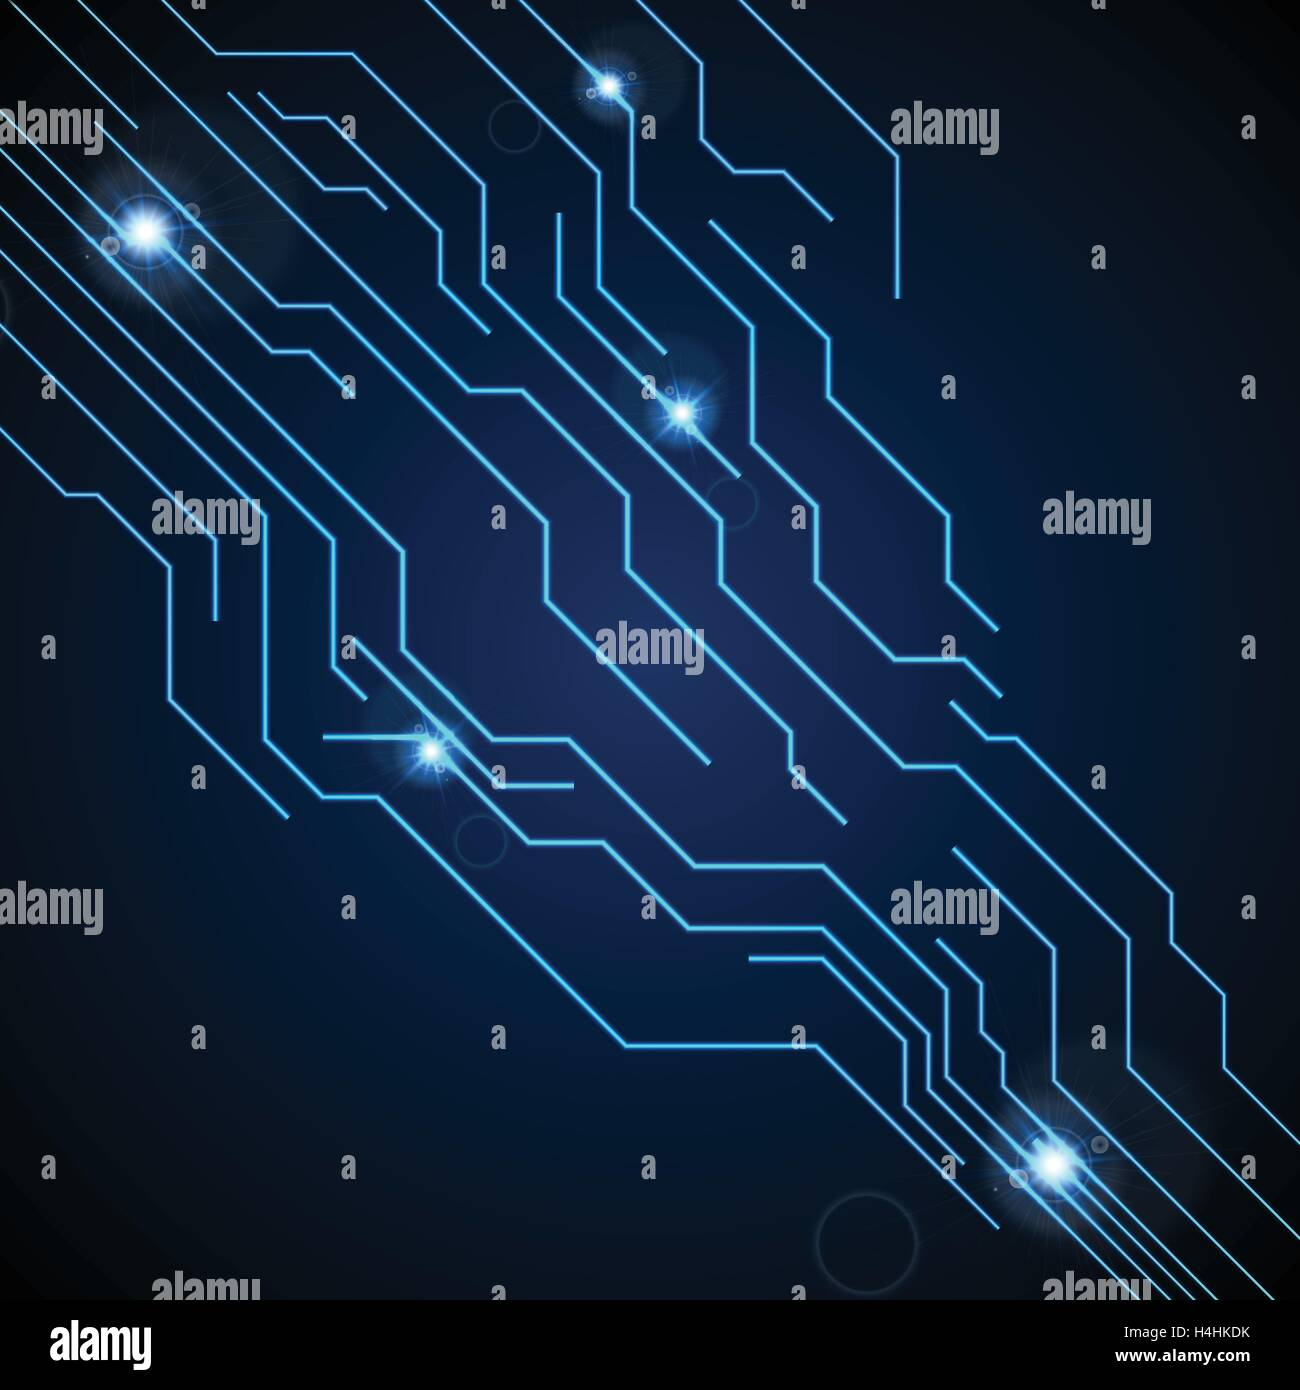 Blue Circuit Board Schematic Manual Guide Wiring Diagram Symbols Dark Technology Background Vector Graphic Design Rh Alamy Com